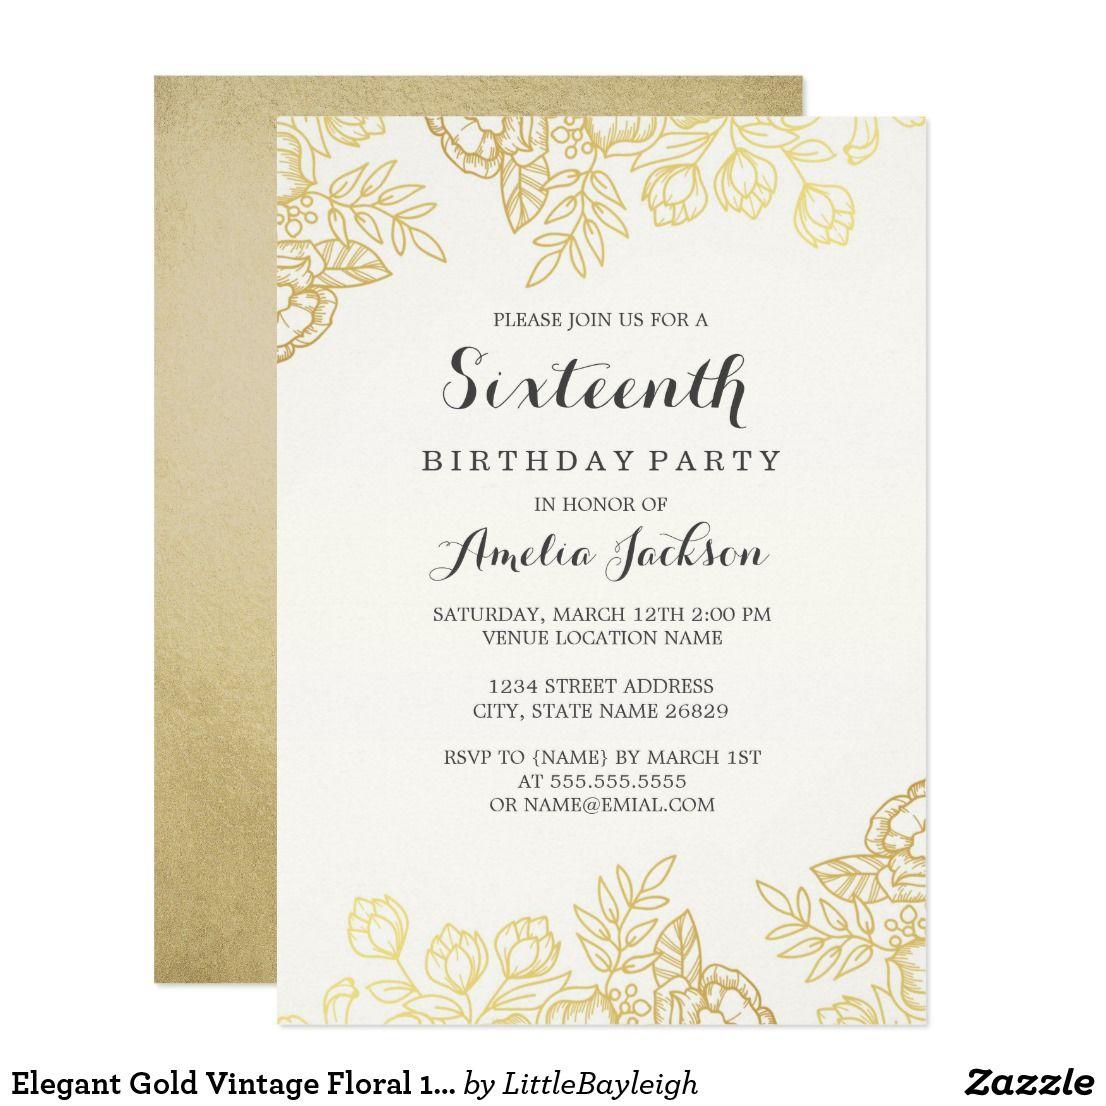 Elegant Gold Vintage Floral 16th Birthday Invitation Zazzle Com In 2021 16th Birthday Invitations Birthday Invitations Floral Birthday Invitations